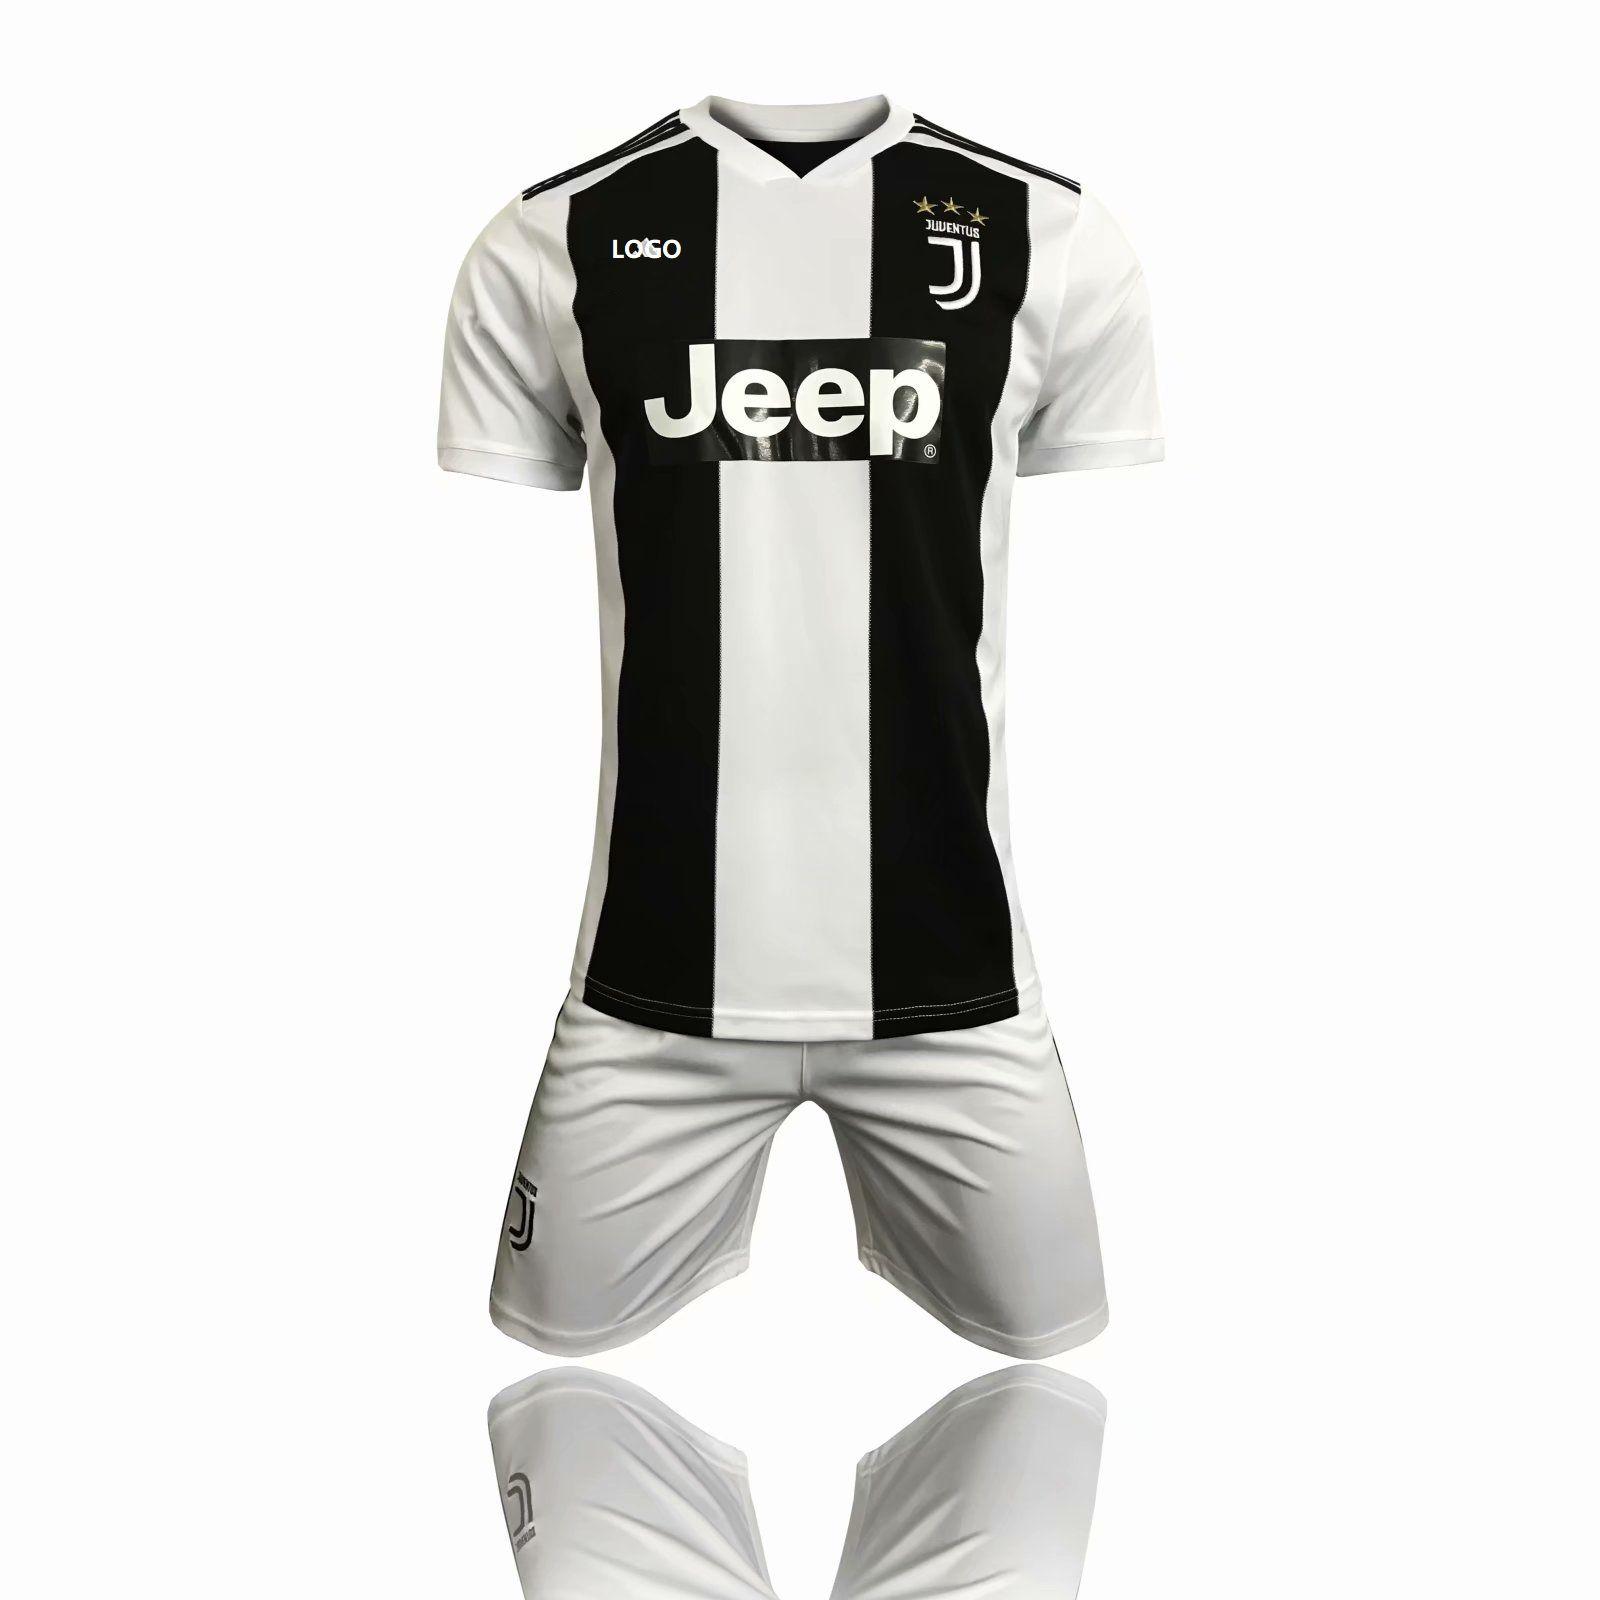 8967eeaf148 18 19 Juventus Home Soccer Uniform AAA Quality